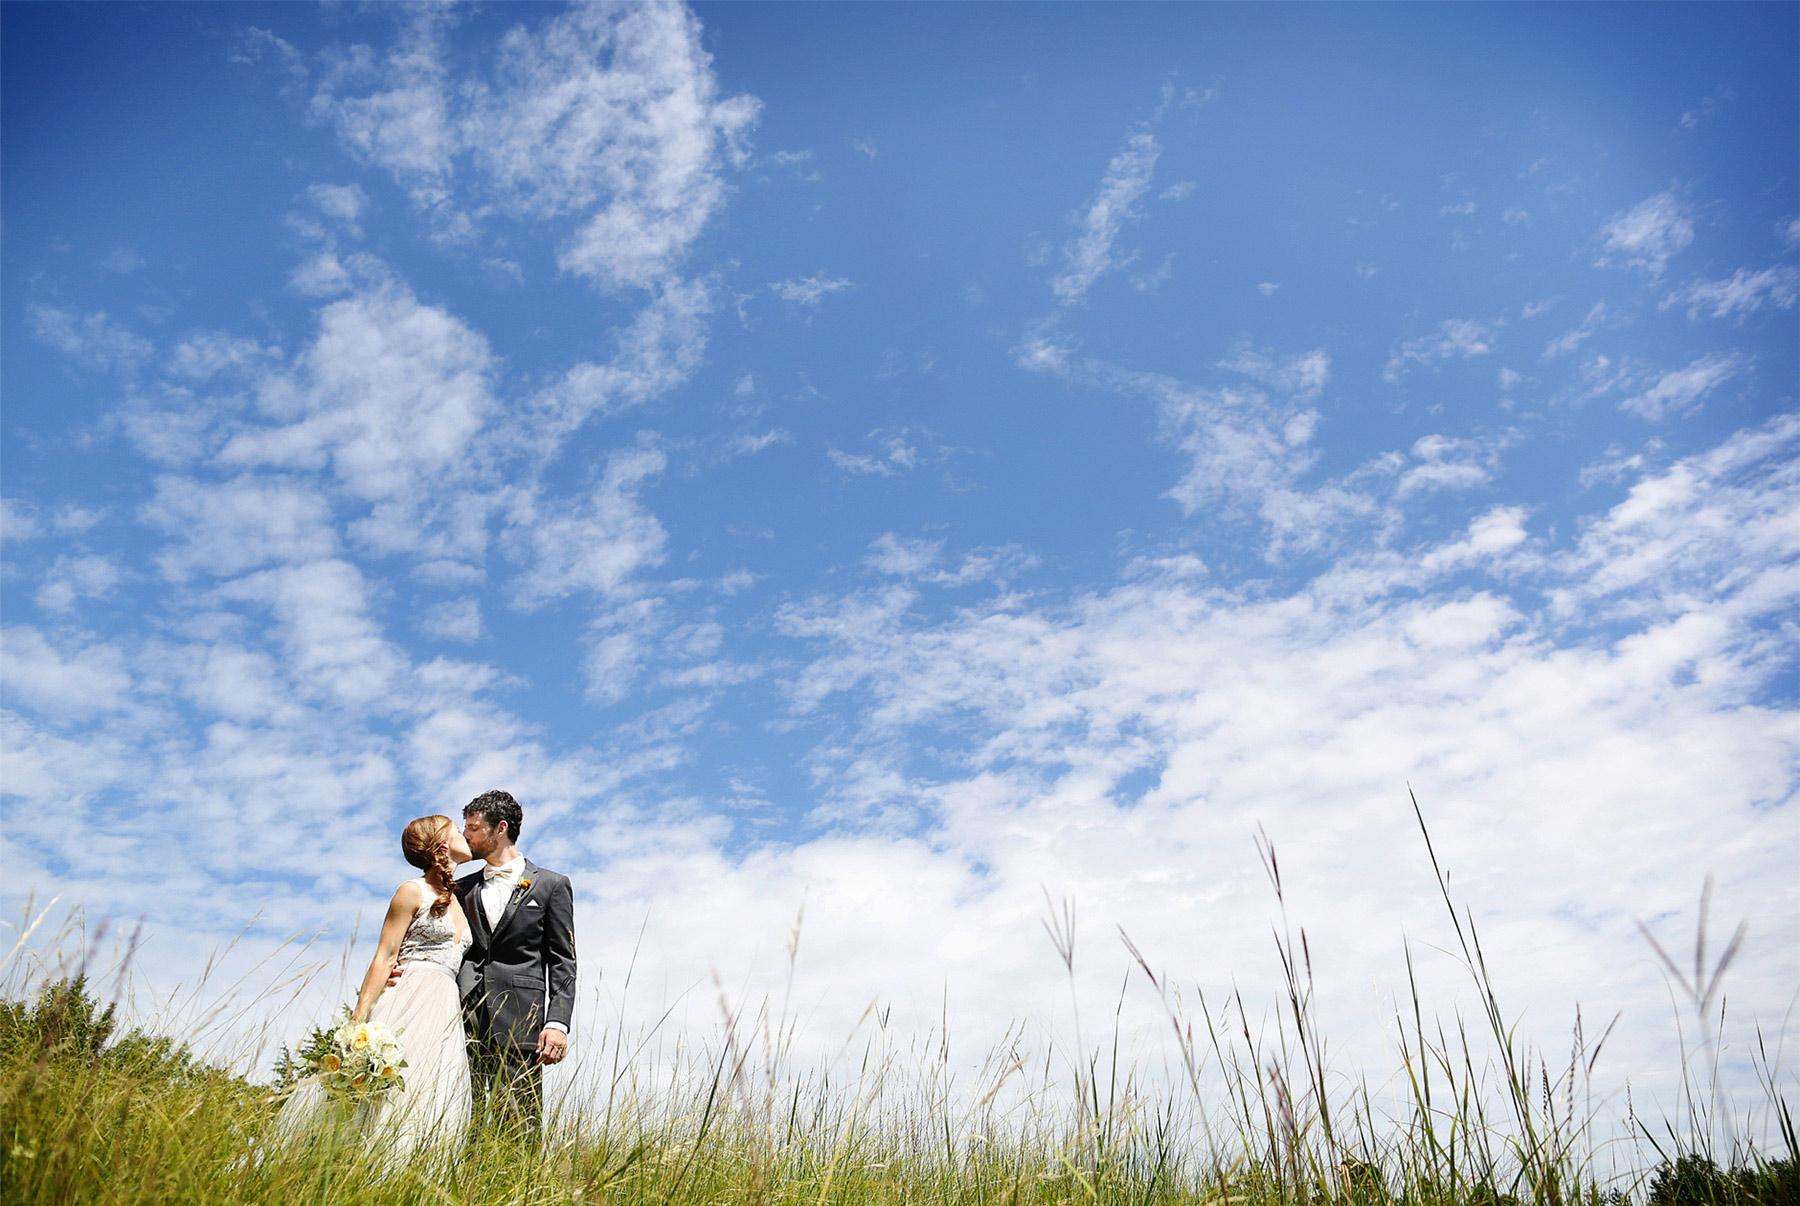 04-Minneapolis-Minnesota-Wedding-Photography-by-Vick-Photography-Field-Blue-Sky-First-Look-Sarah-&-Tom.jpg